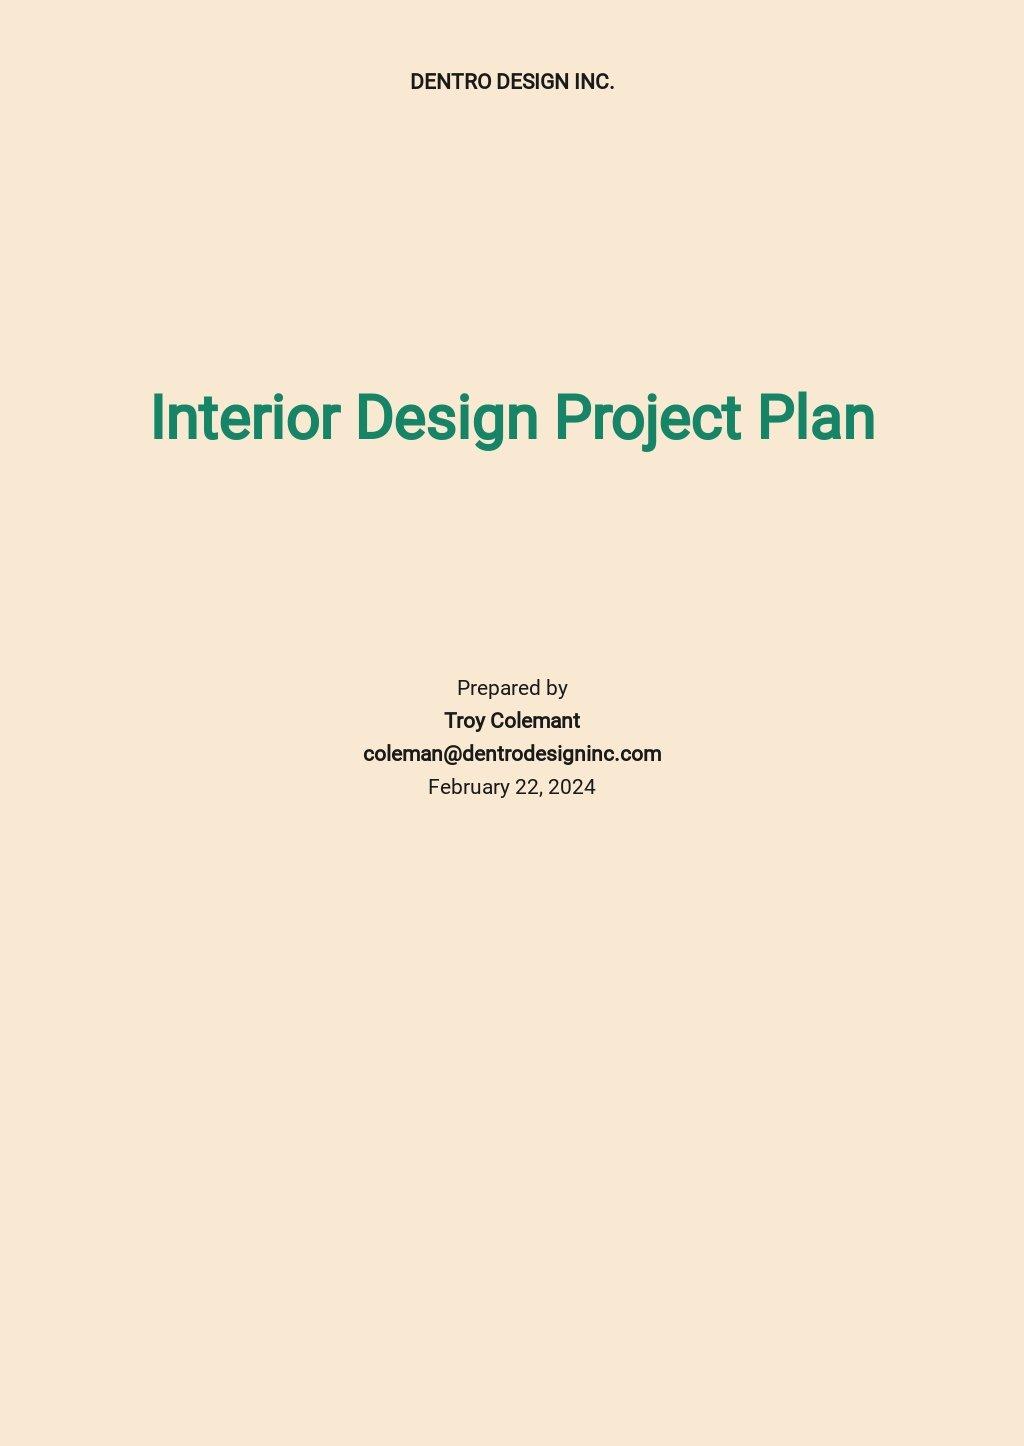 Interior Design Project Plan Template.jpe